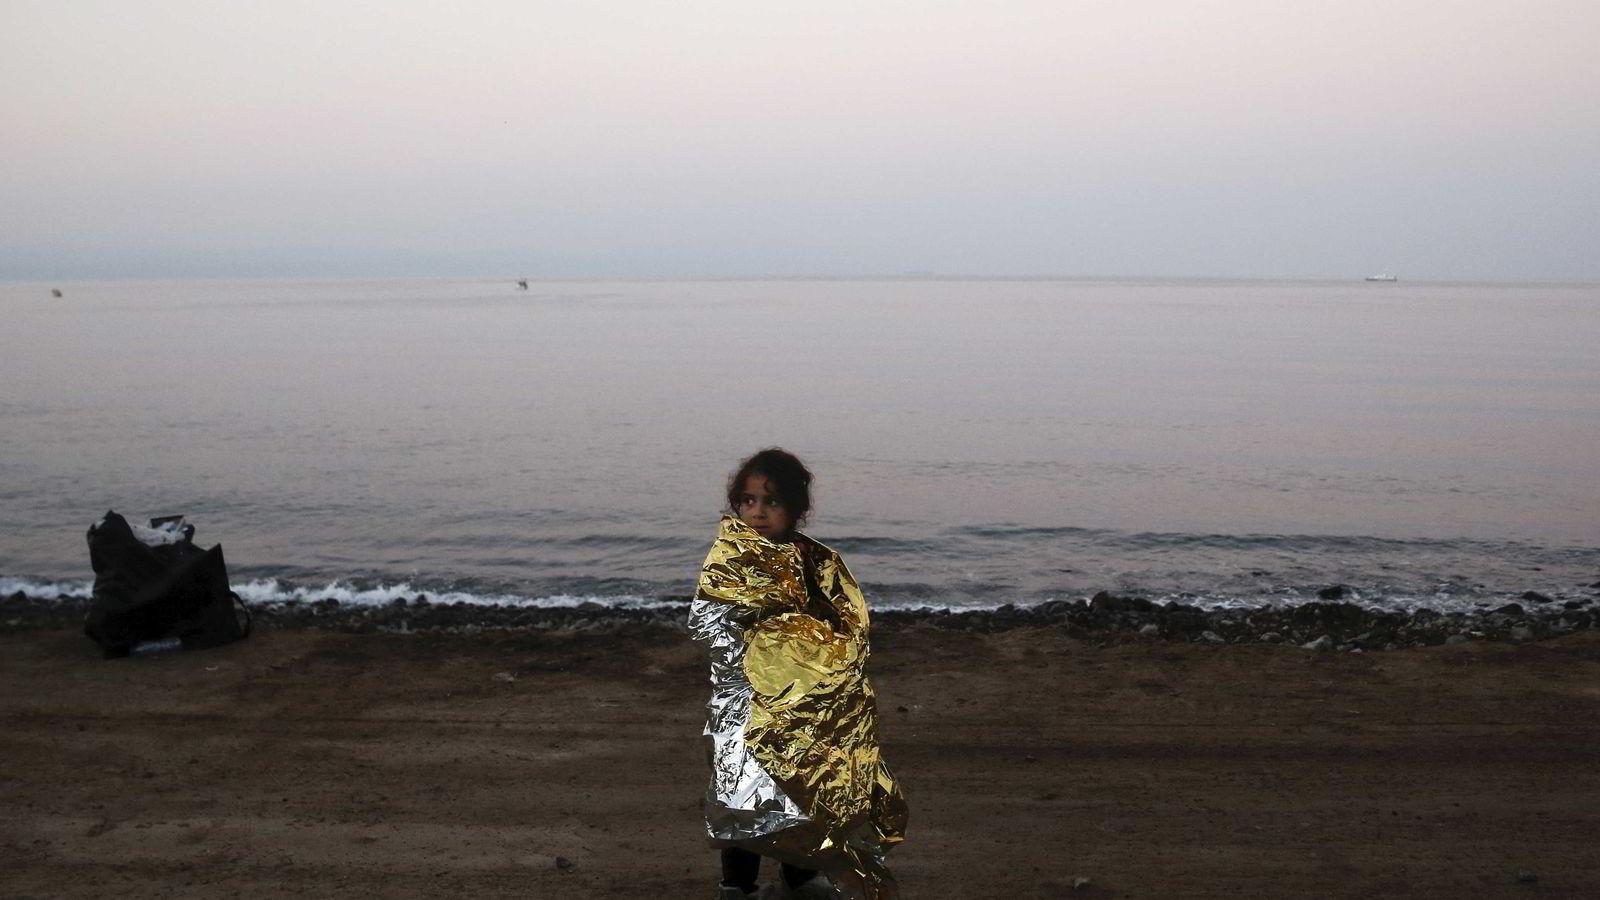 Det er aldri berre ein årsak til at enkelte land endar i konflikt, skriver artikkelforfatteren. Foto: Alkis Konstantinidis, Reuters/NTB Scanpix